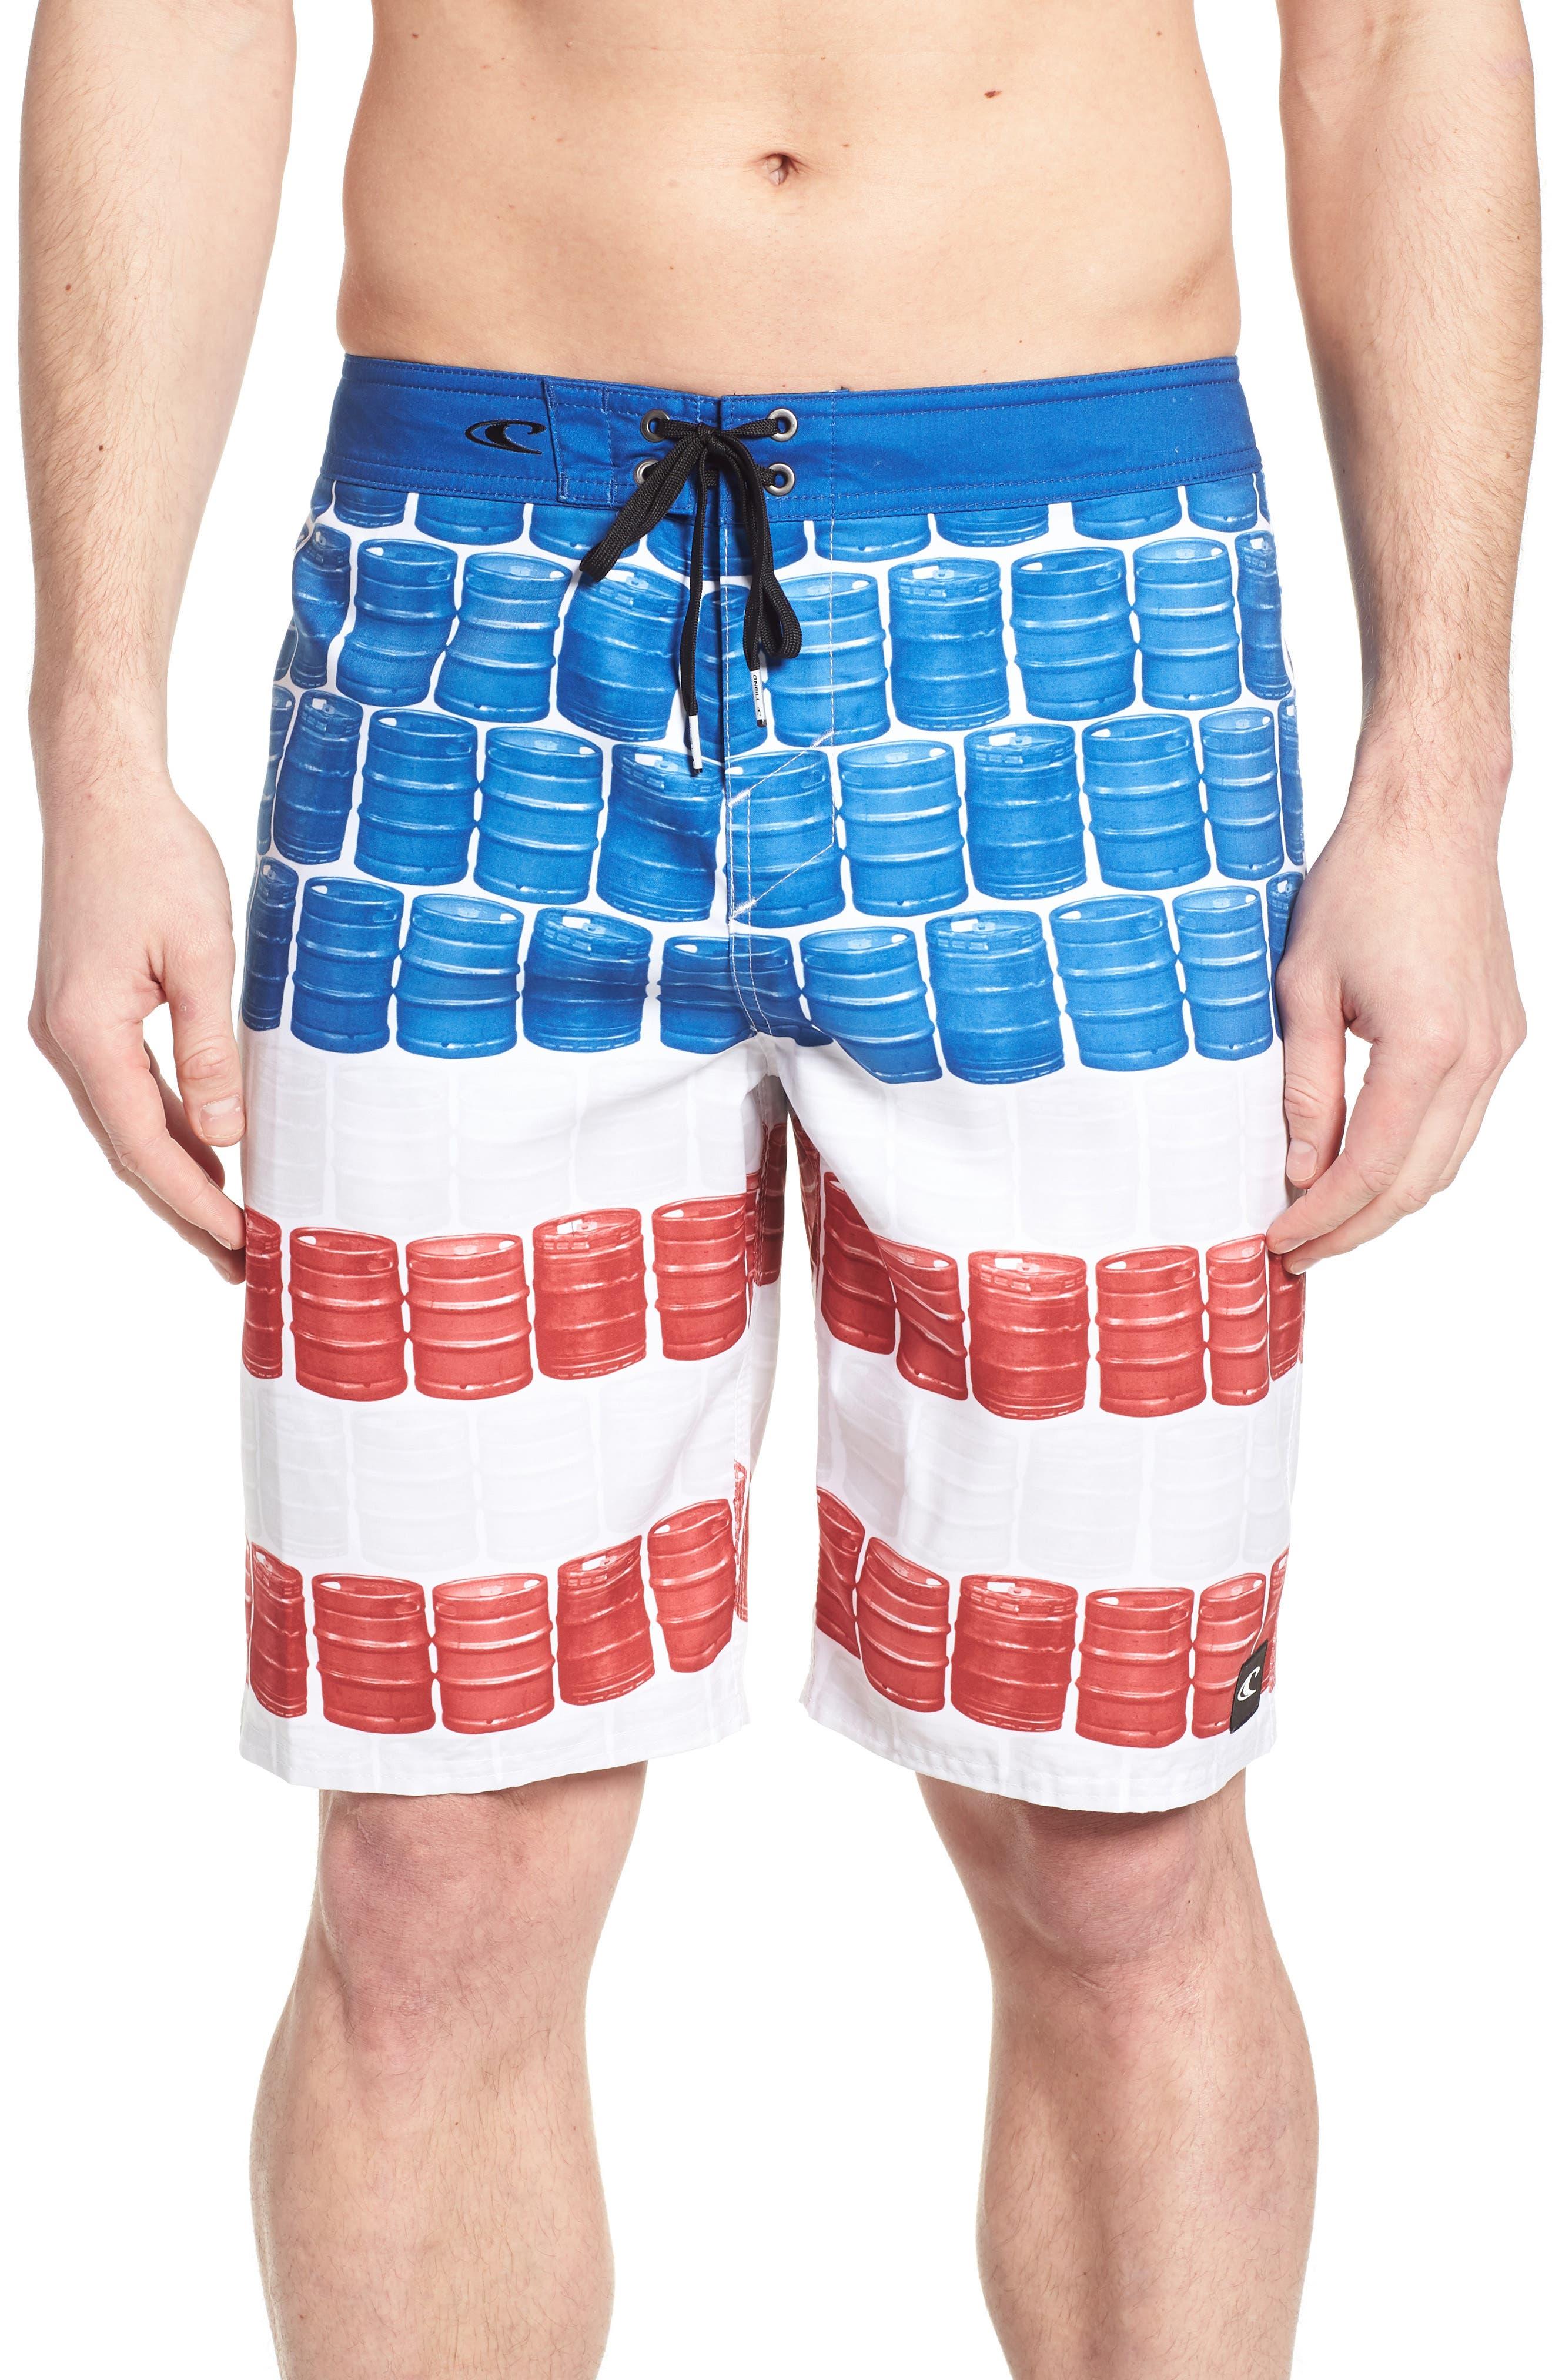 Kegleg Board Shorts,                         Main,                         color, 840